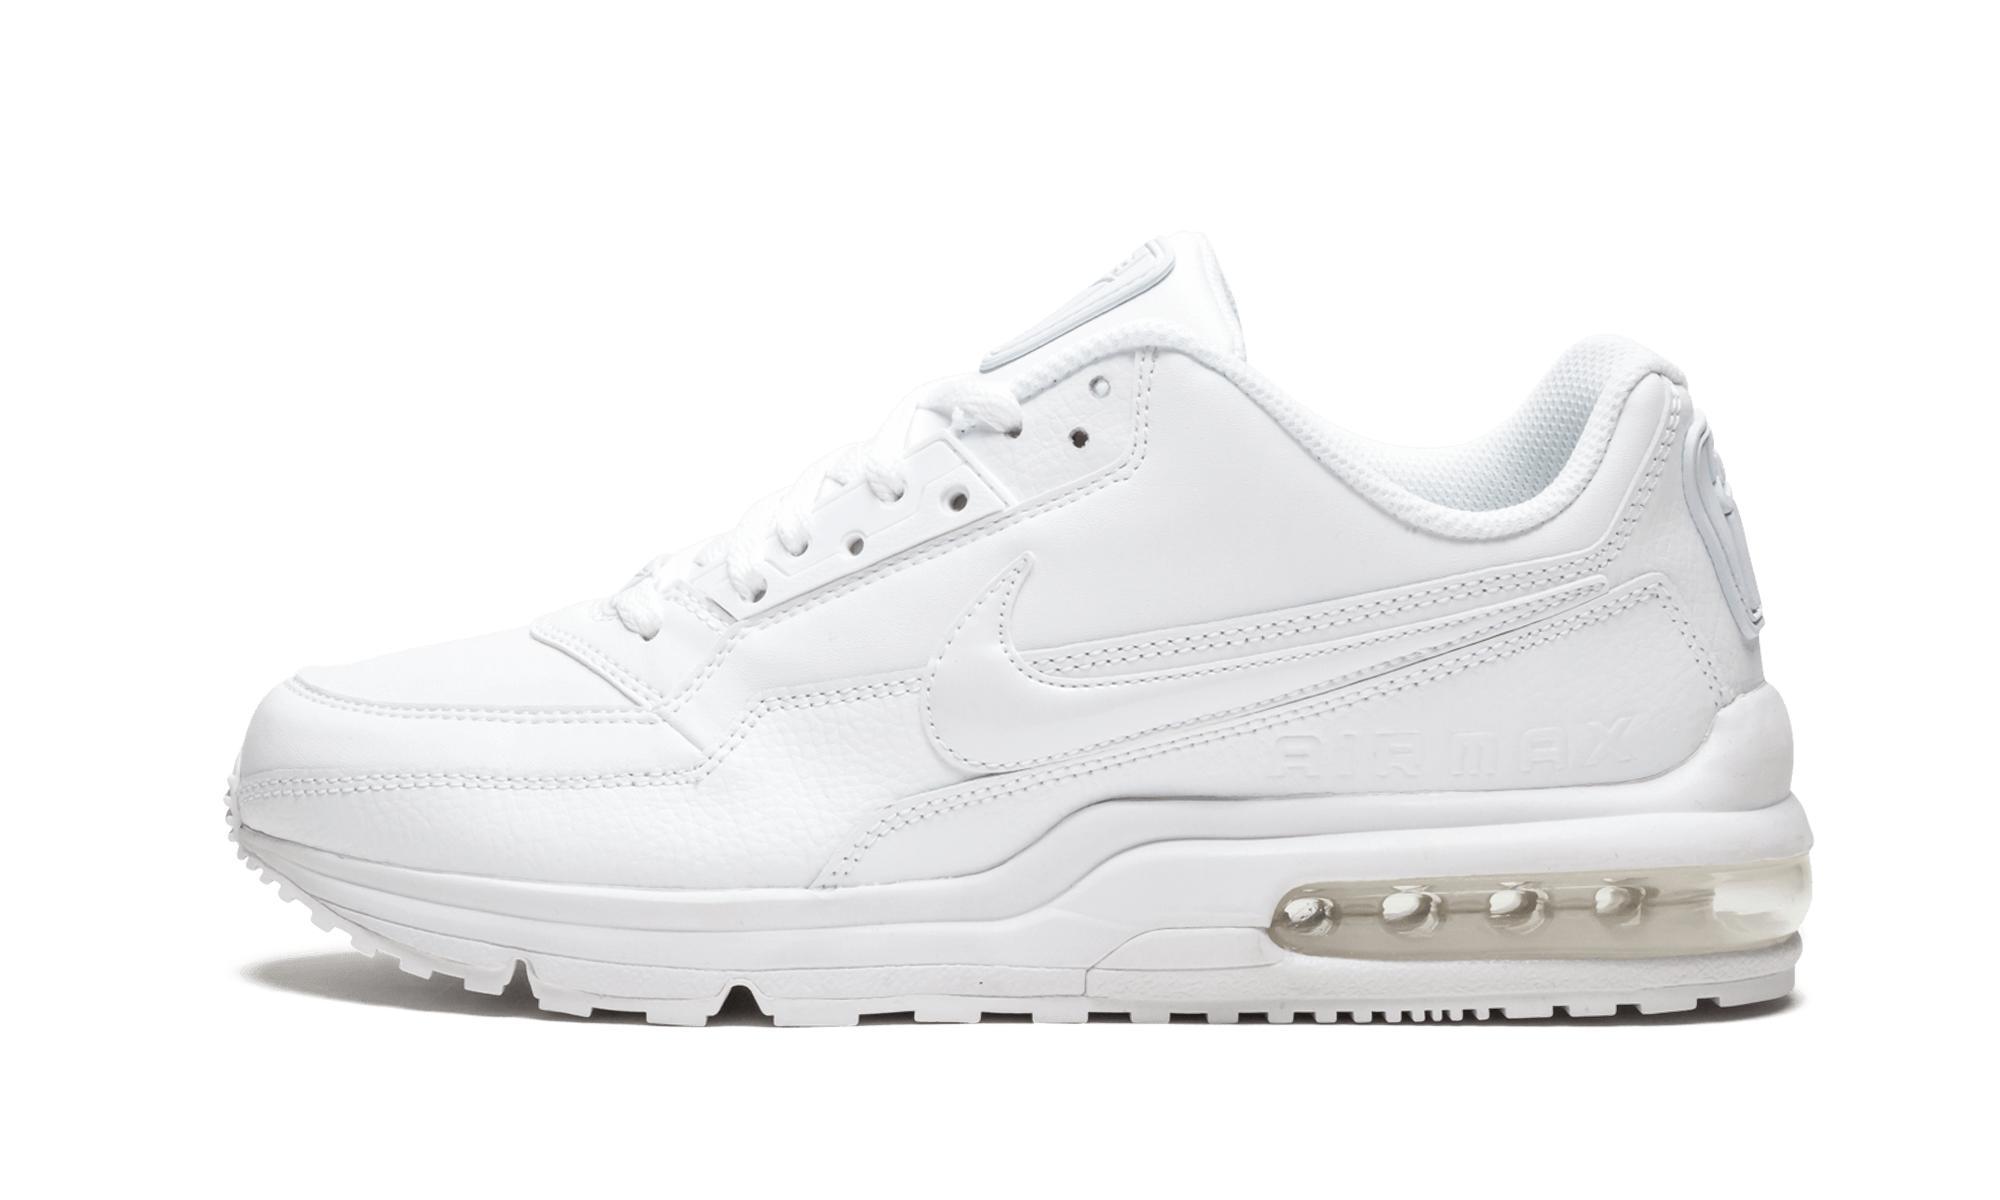 separation shoes 46d0d a8fa8 Nike - White Air Max Ltd 3 for Men - Lyst. View fullscreen